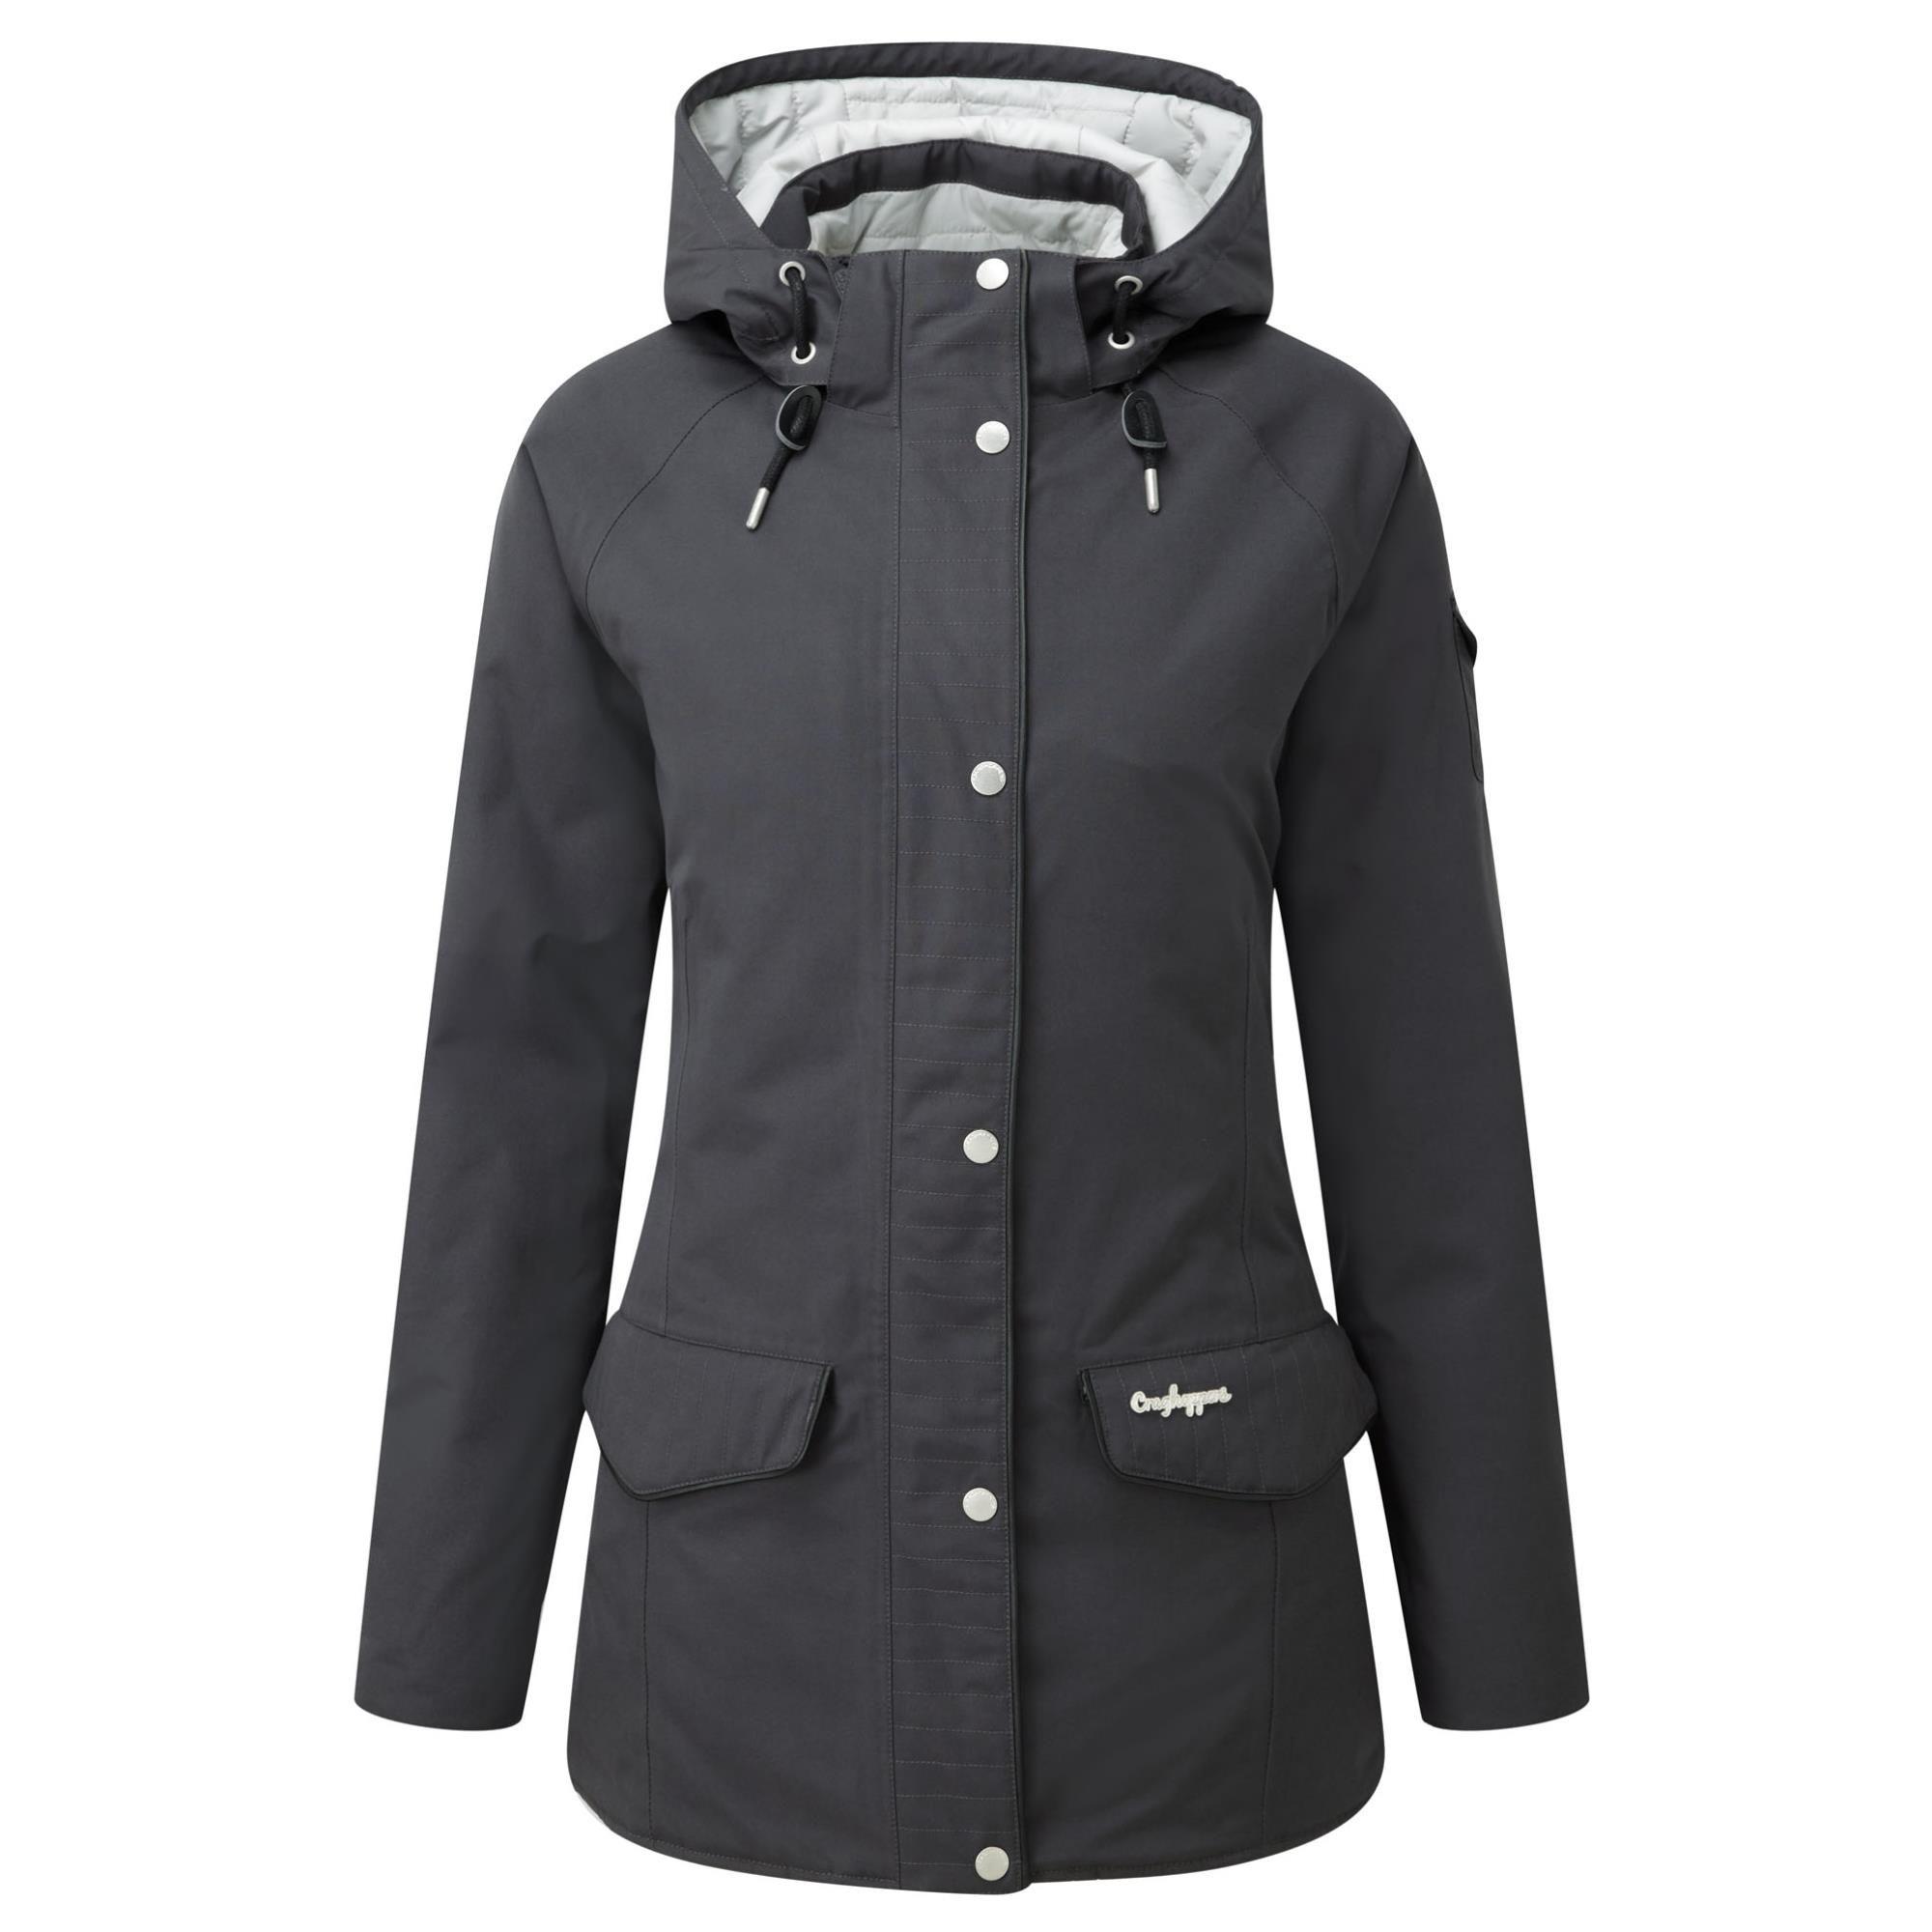 3d1df8263e71ae Xtend-Angebote Craghoppers 250 Jacke Winterparka Damen grau Gr. 42:  Category: Outdoorbekleidung